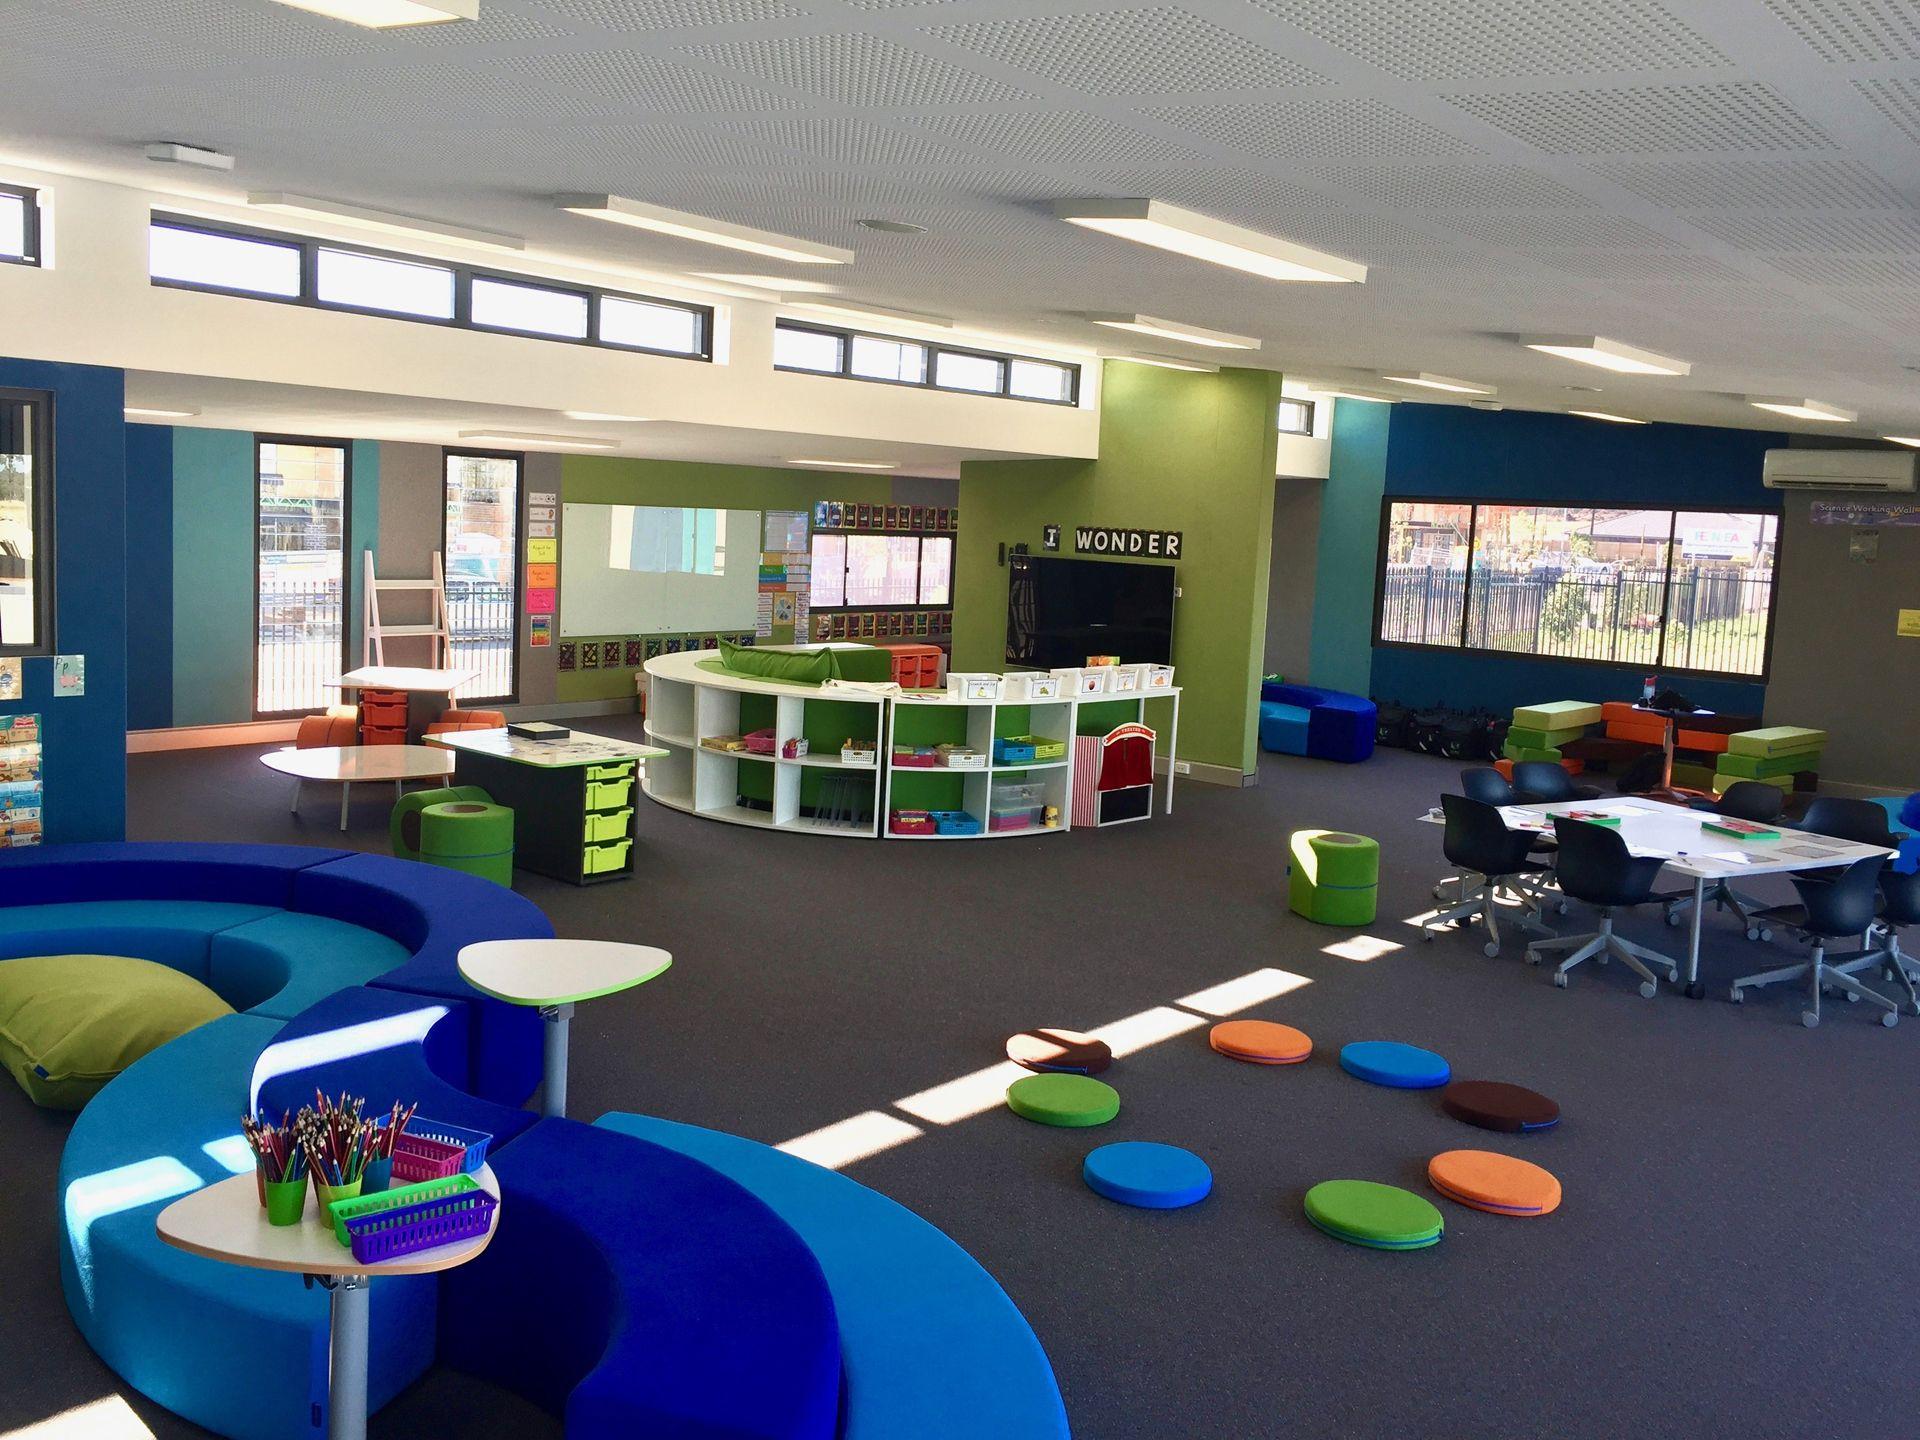 Classroom Design Is the Next Frontier in Universal Design